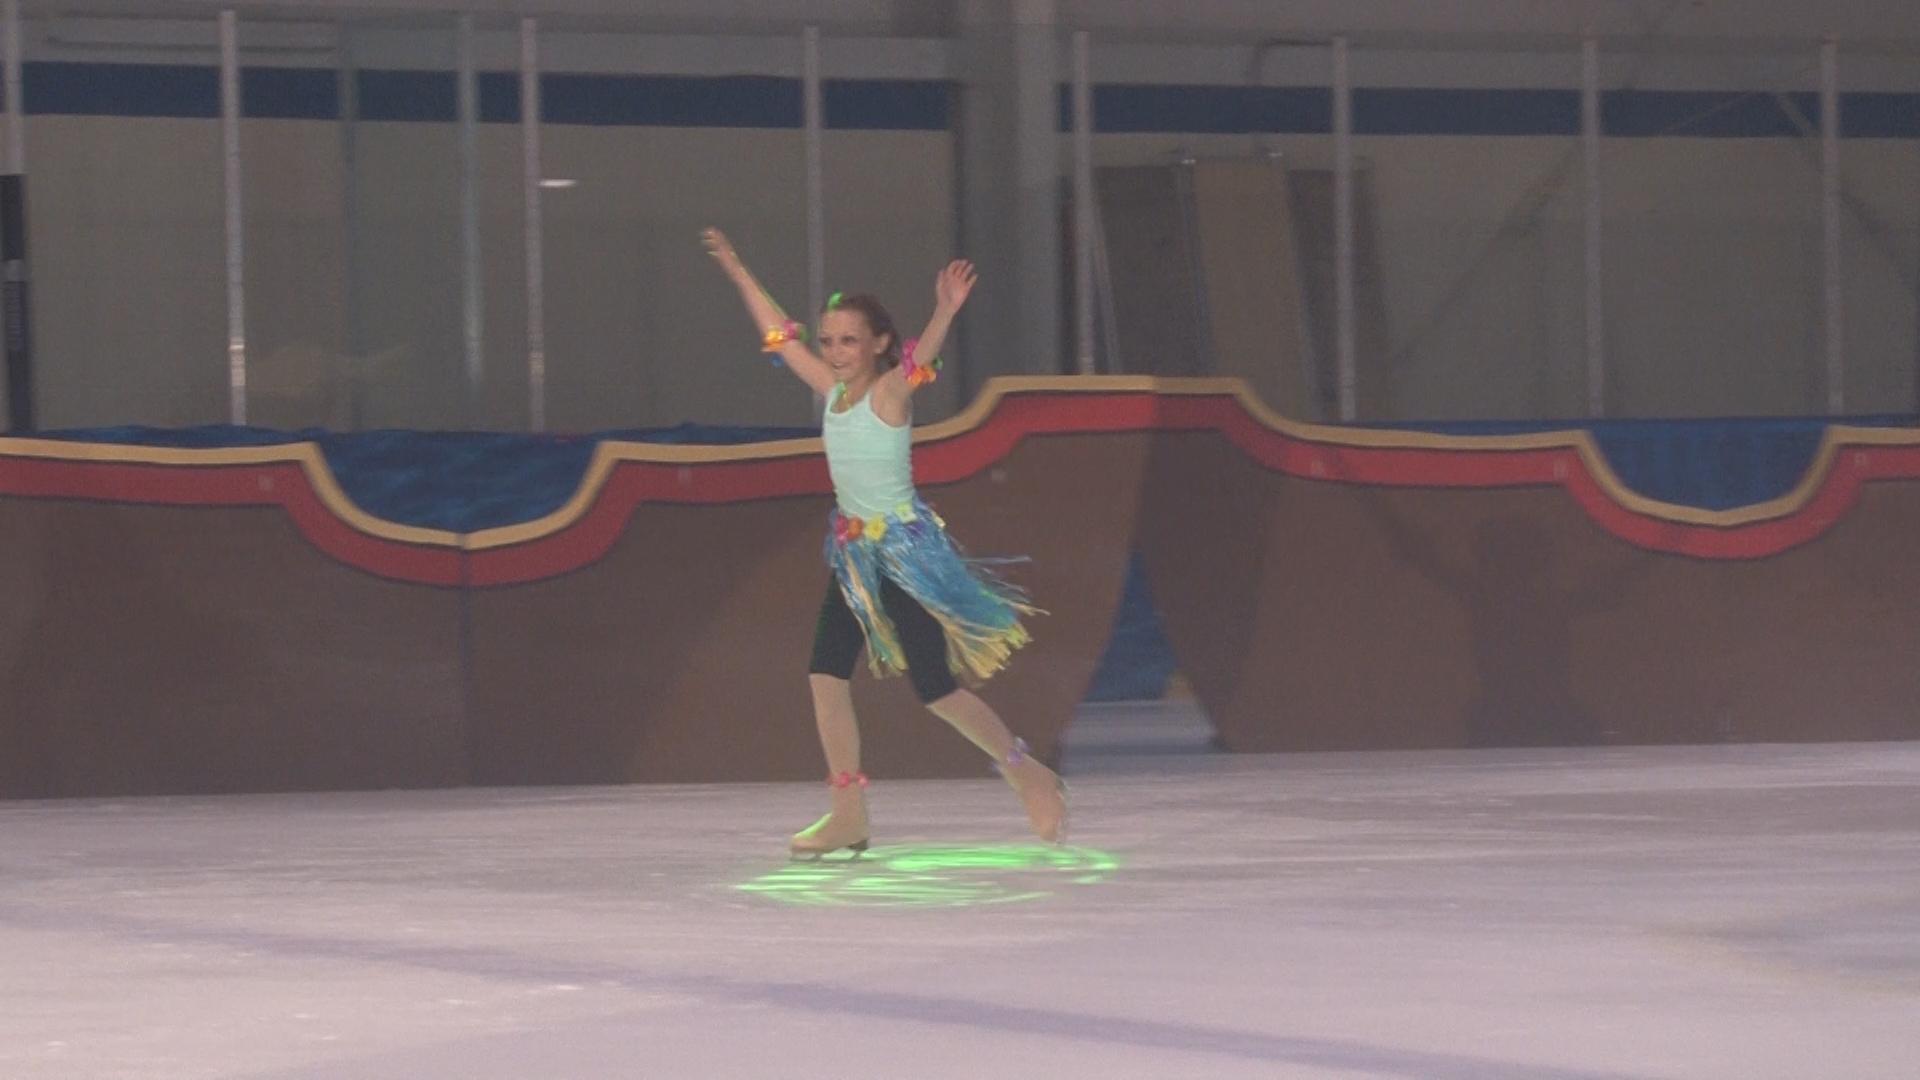 Power Play Maui Skate on Ice 071417.00_58_52_07.Still089.jpg